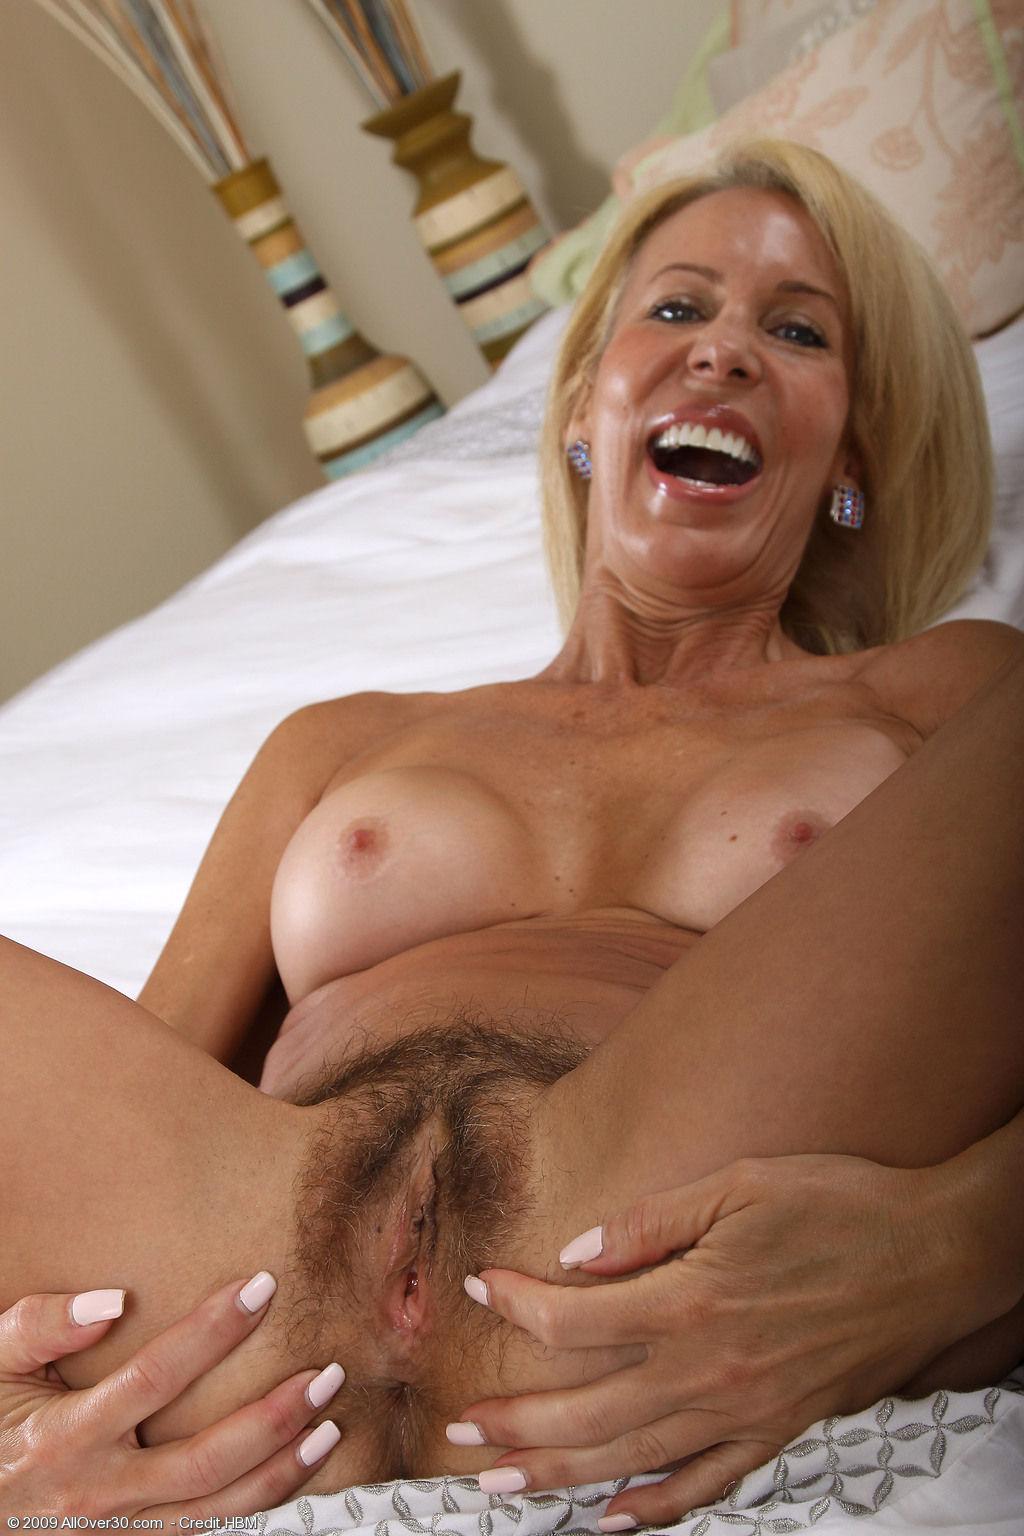 Consider, hairy blonde milf mom love cock topic